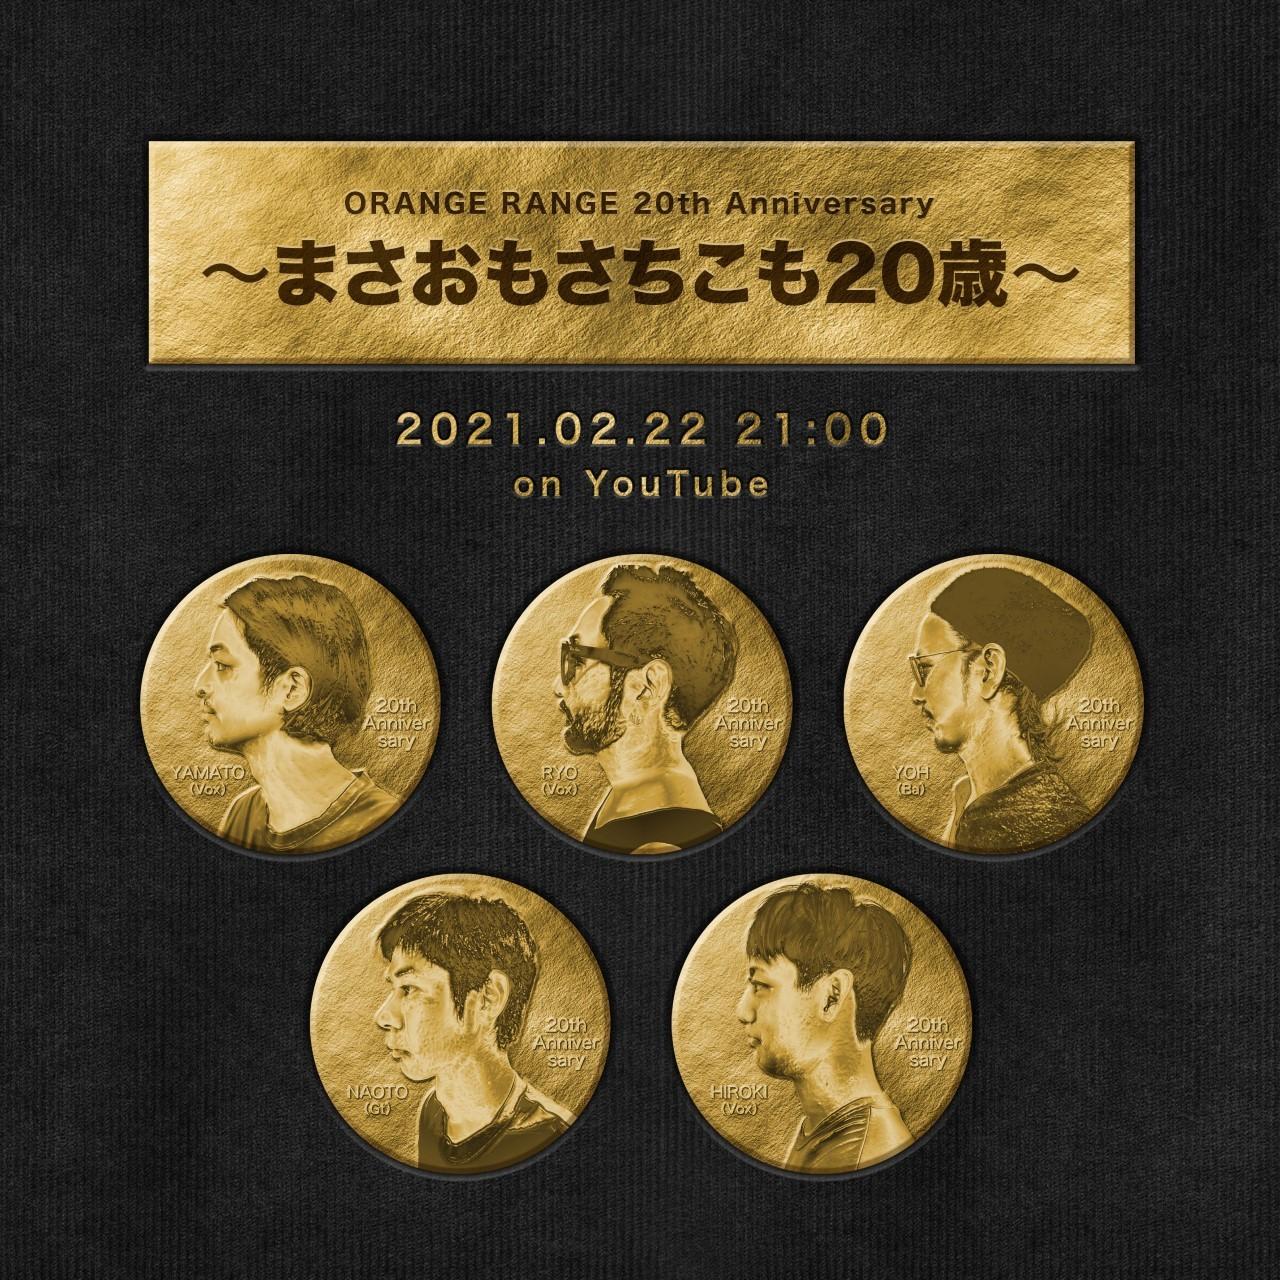 『ORANGE RANGE 20th Anniversary 〜まさおもさちこも20歳〜』